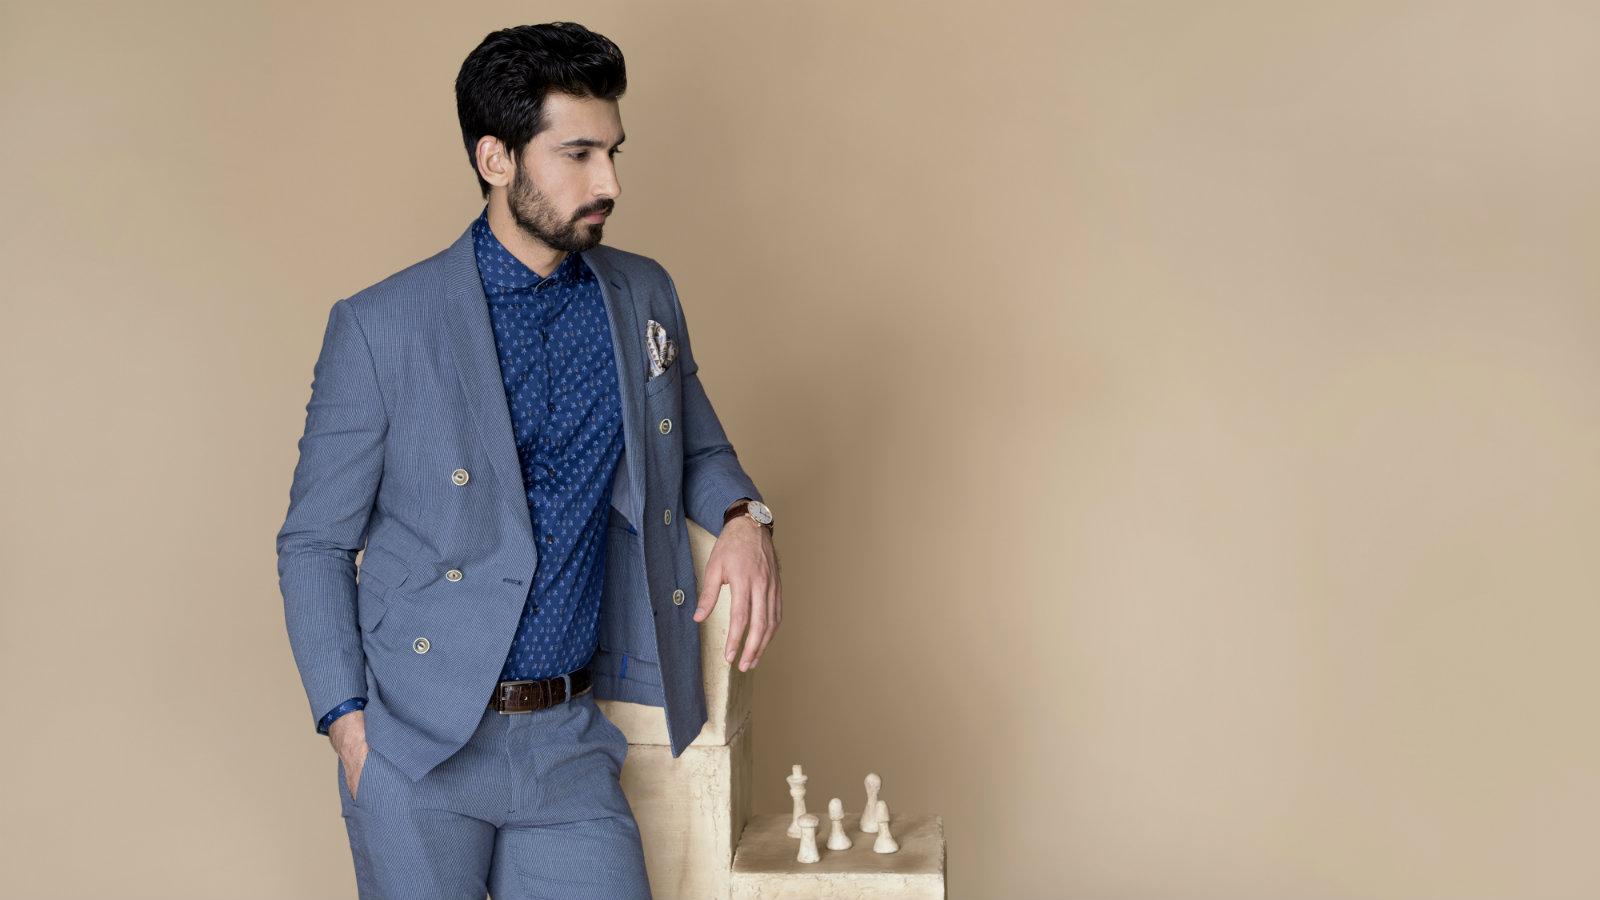 Andamen To Van Heusen Indian Men Are Finally Getting A Much Needed Wardrobe Update Quartz India